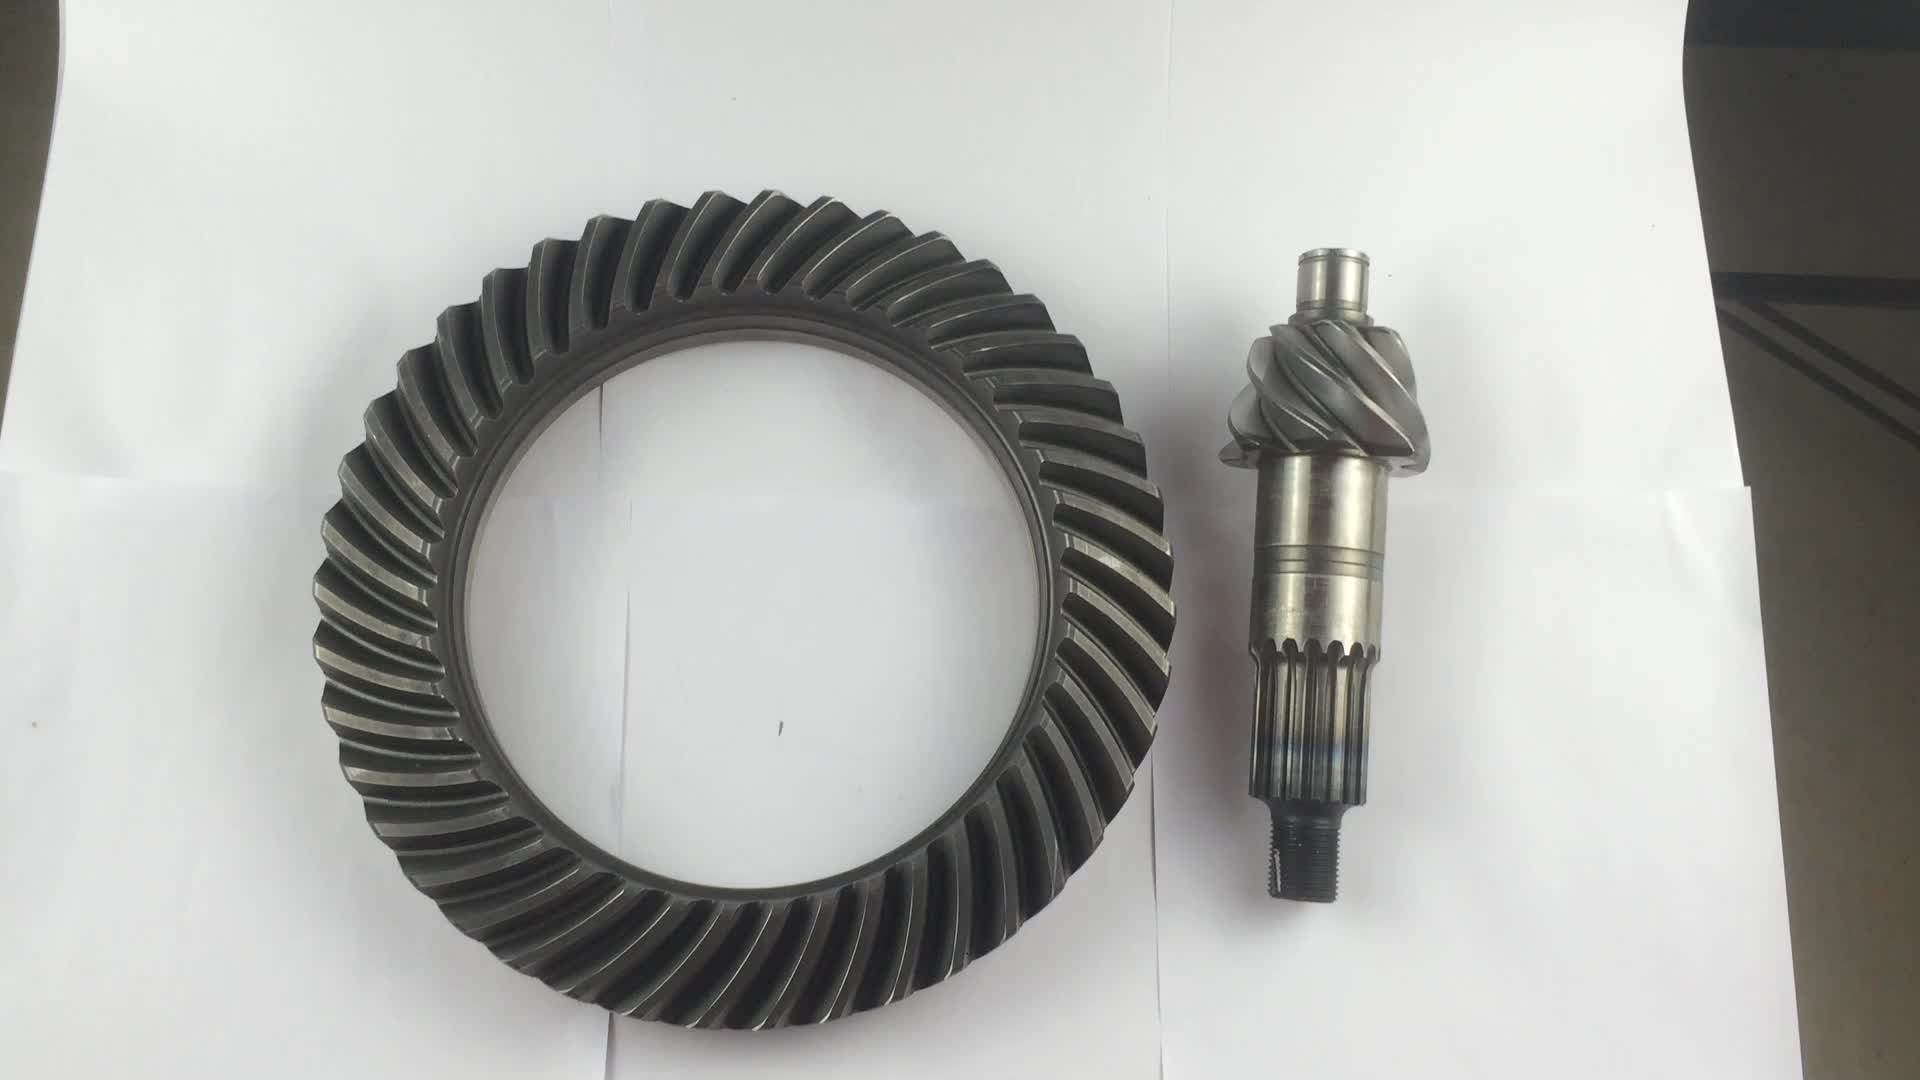 Piñón de rueda de corona espiral engranajes cónicos para isuzu